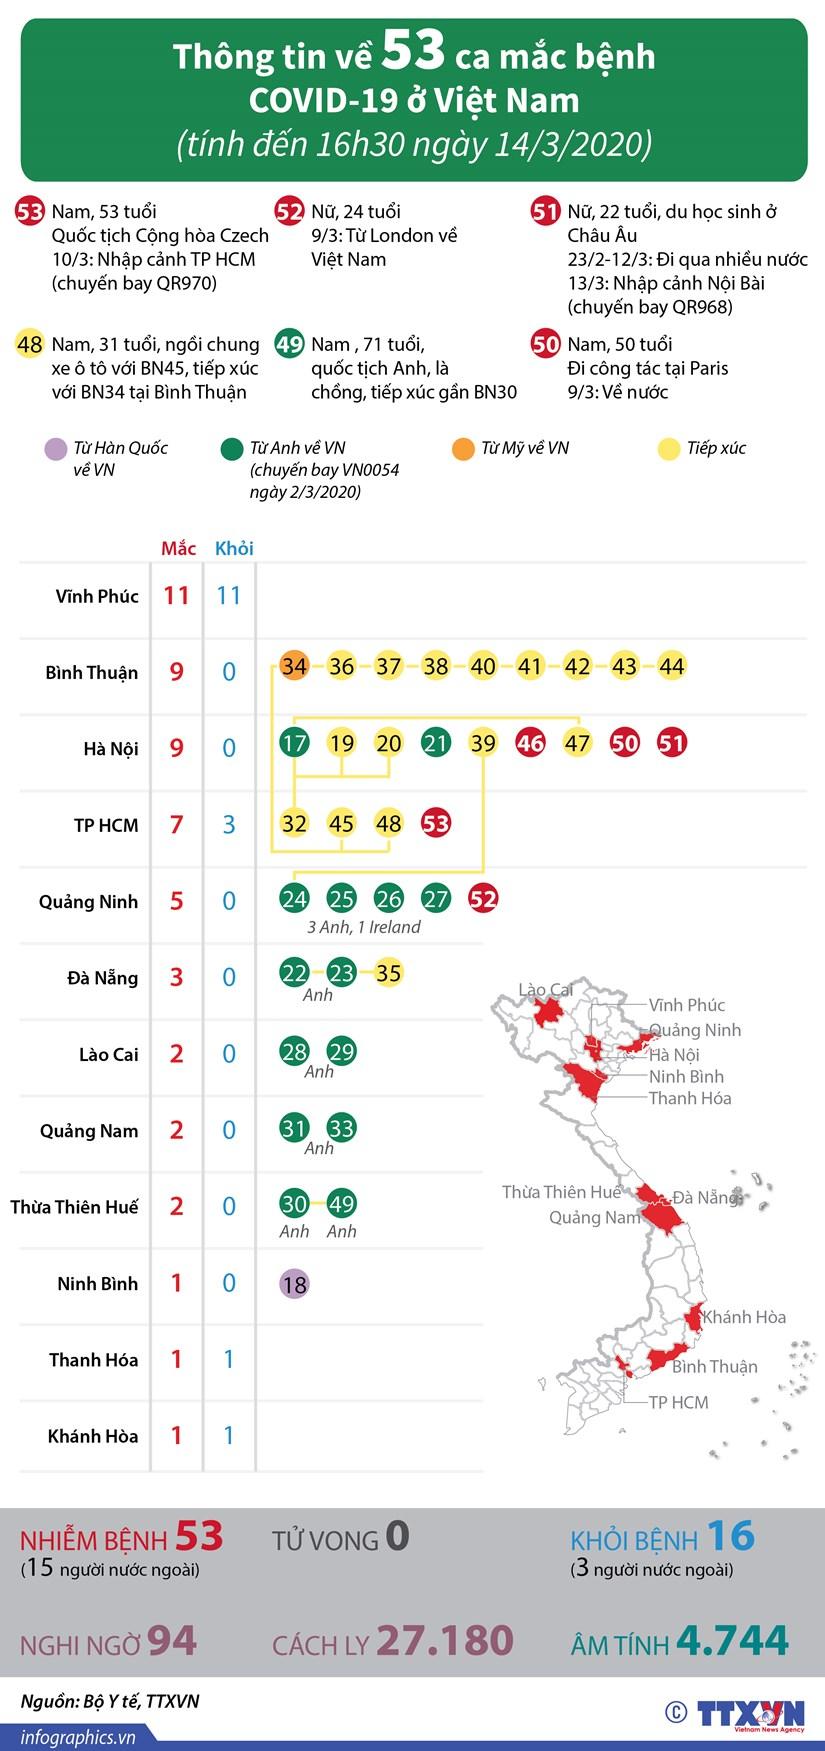 [Infographics] Thong tin ve 53 ca mac benh COVID-19 o Viet Nam hinh anh 1